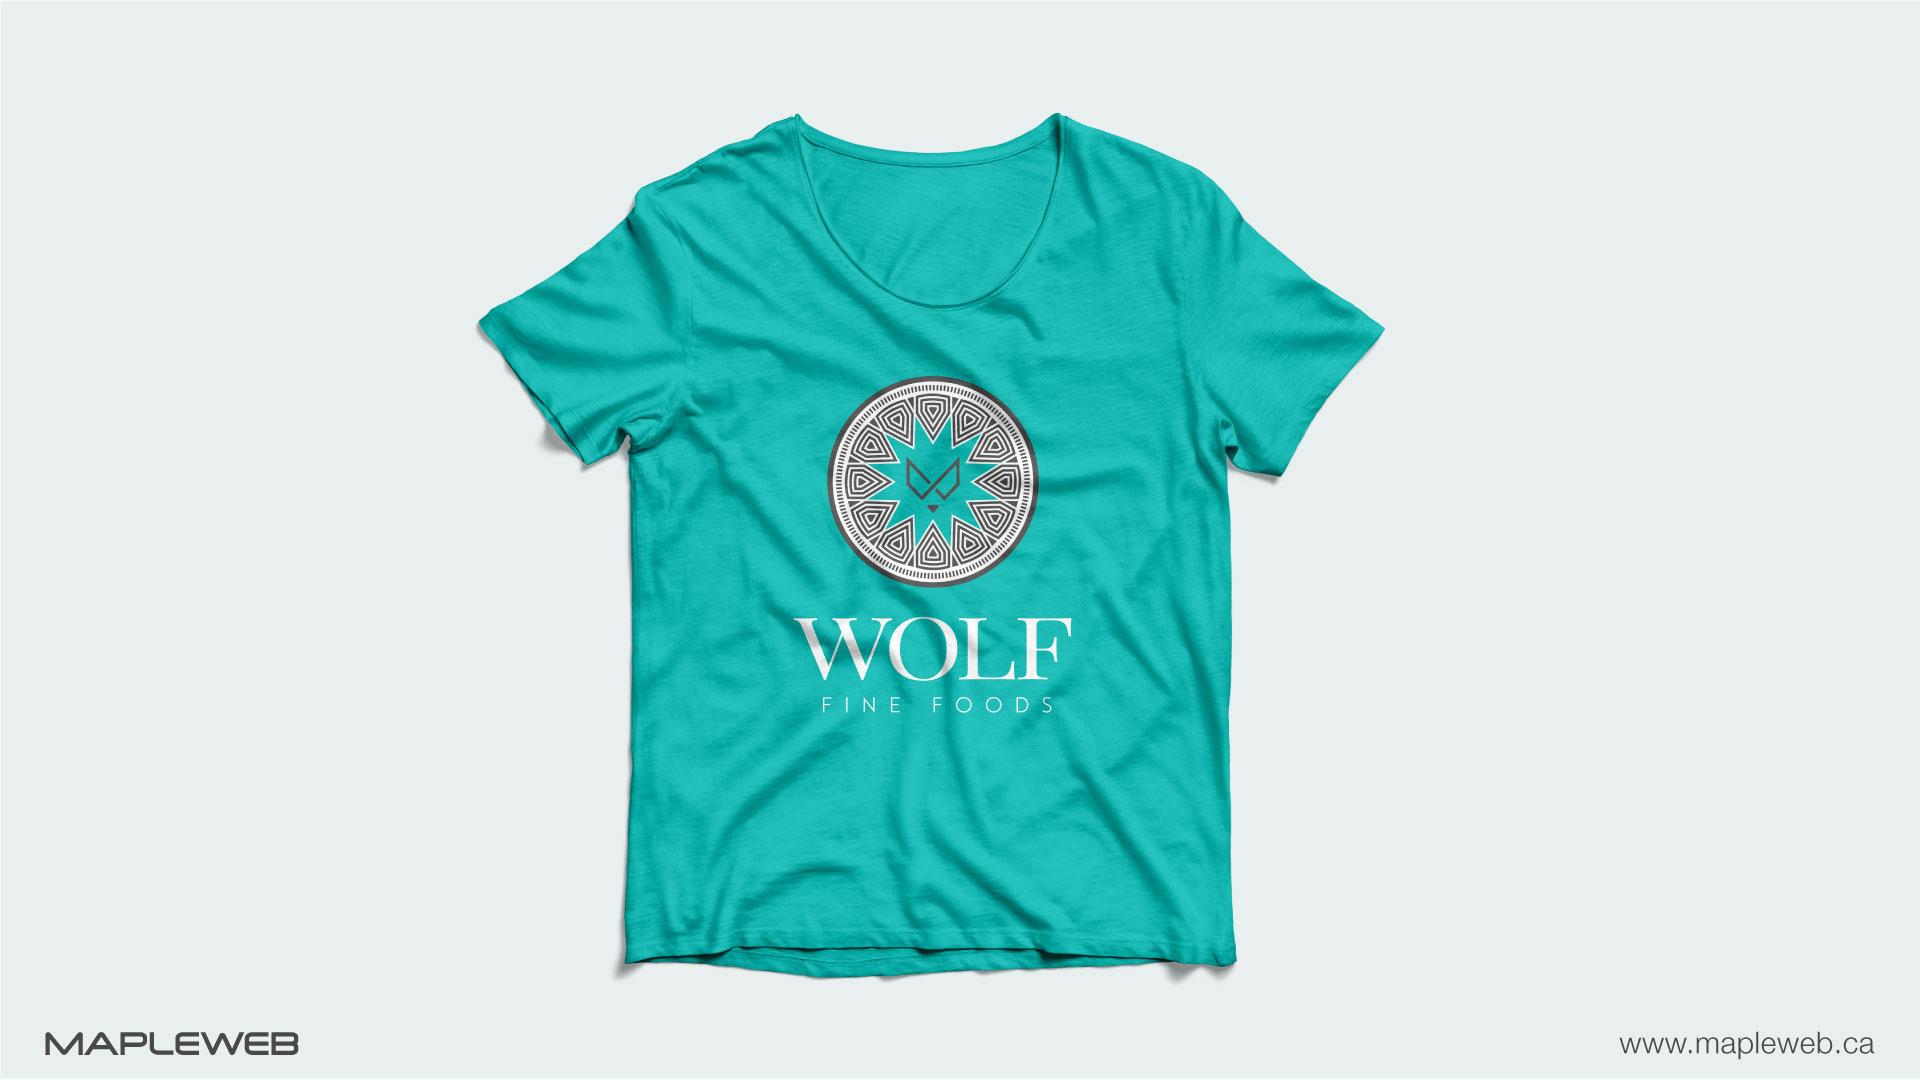 wolf-fine-foods-brand-logo-design-by-mapleweb-vancouver-canada-tshirt-mock